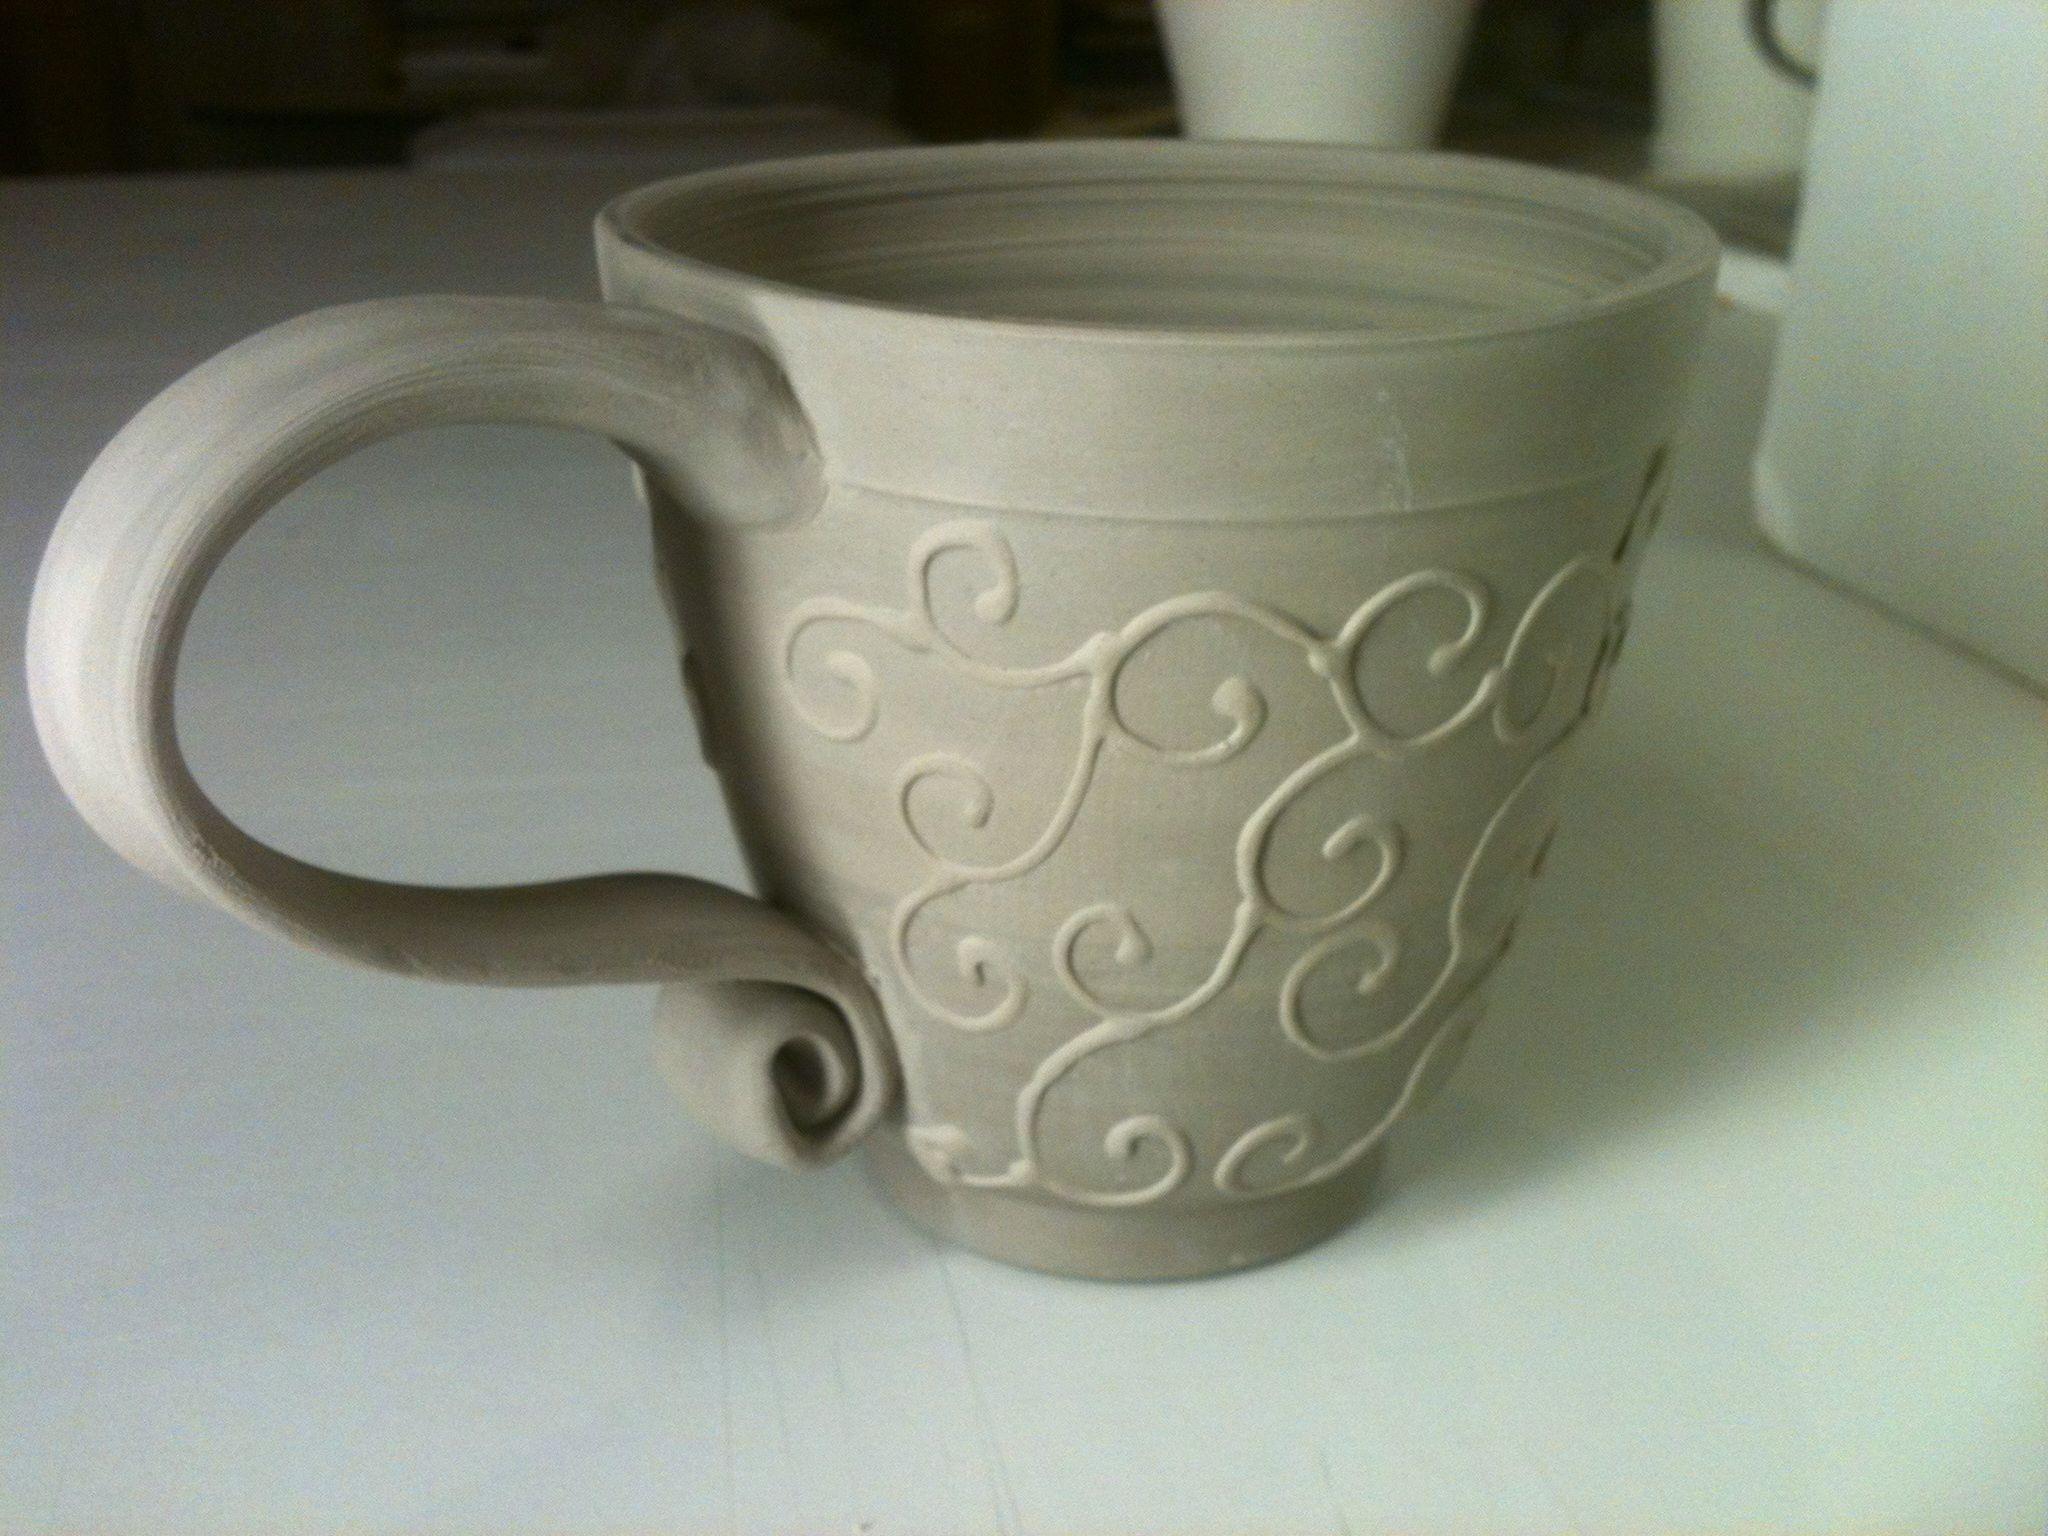 roseville vase price guide of 10 ceramic pot saucer ceramic rectangular planter includes planter within symmetrical pottery new mugs 03 createniks